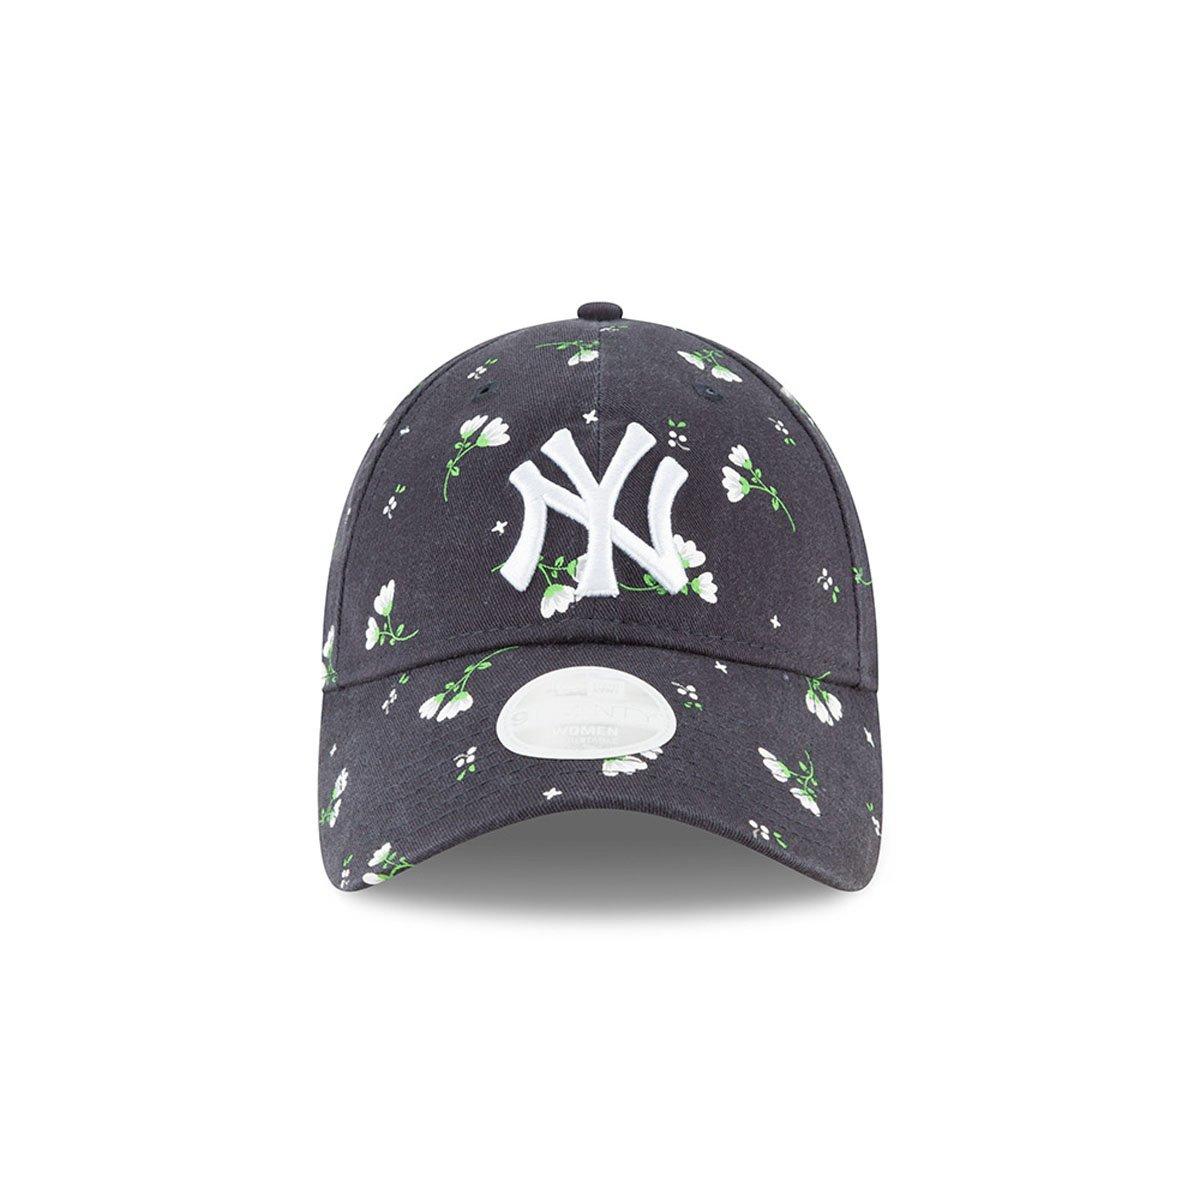 Gorra Ny Yankees New Era - Dama  e86cae30cab4